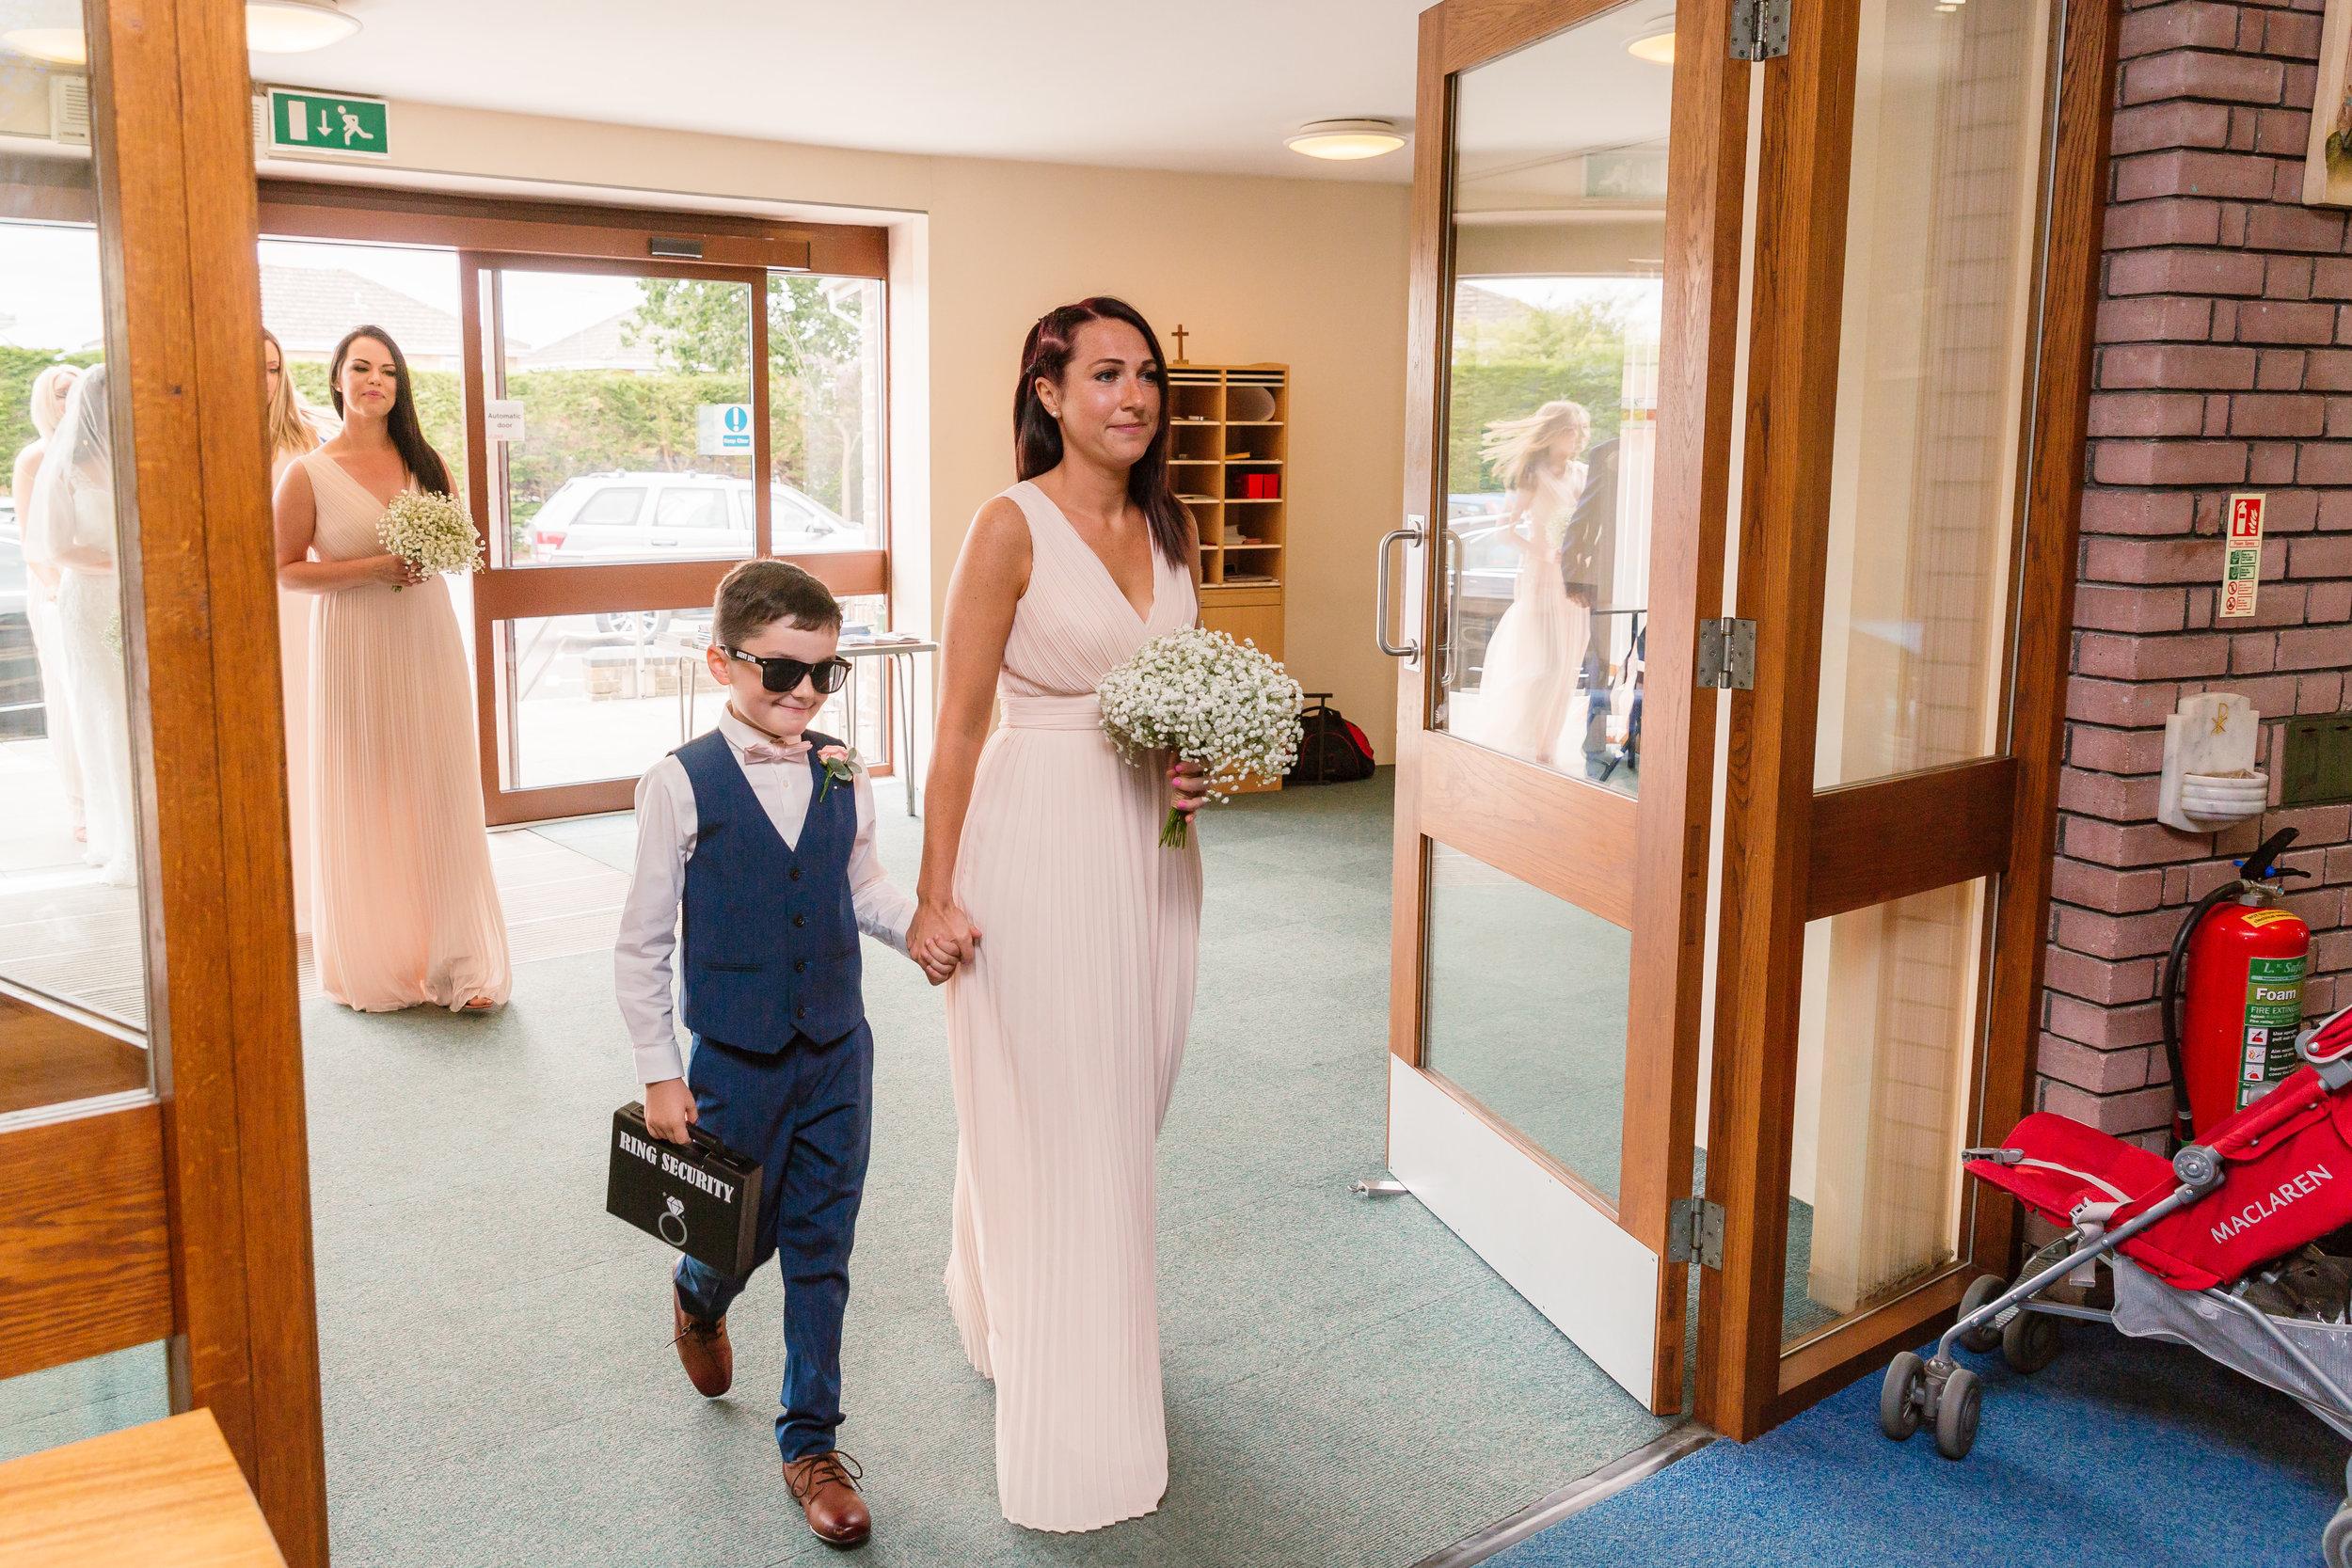 Sarah-Fishlock-Photography : Hampshire-wedding-photographer-hampshire : fleet-wedding-photographer-fleet : Meade-Hall-Wedding-Photographer : Meade-Hall-Wedding-Photos-411.jpg